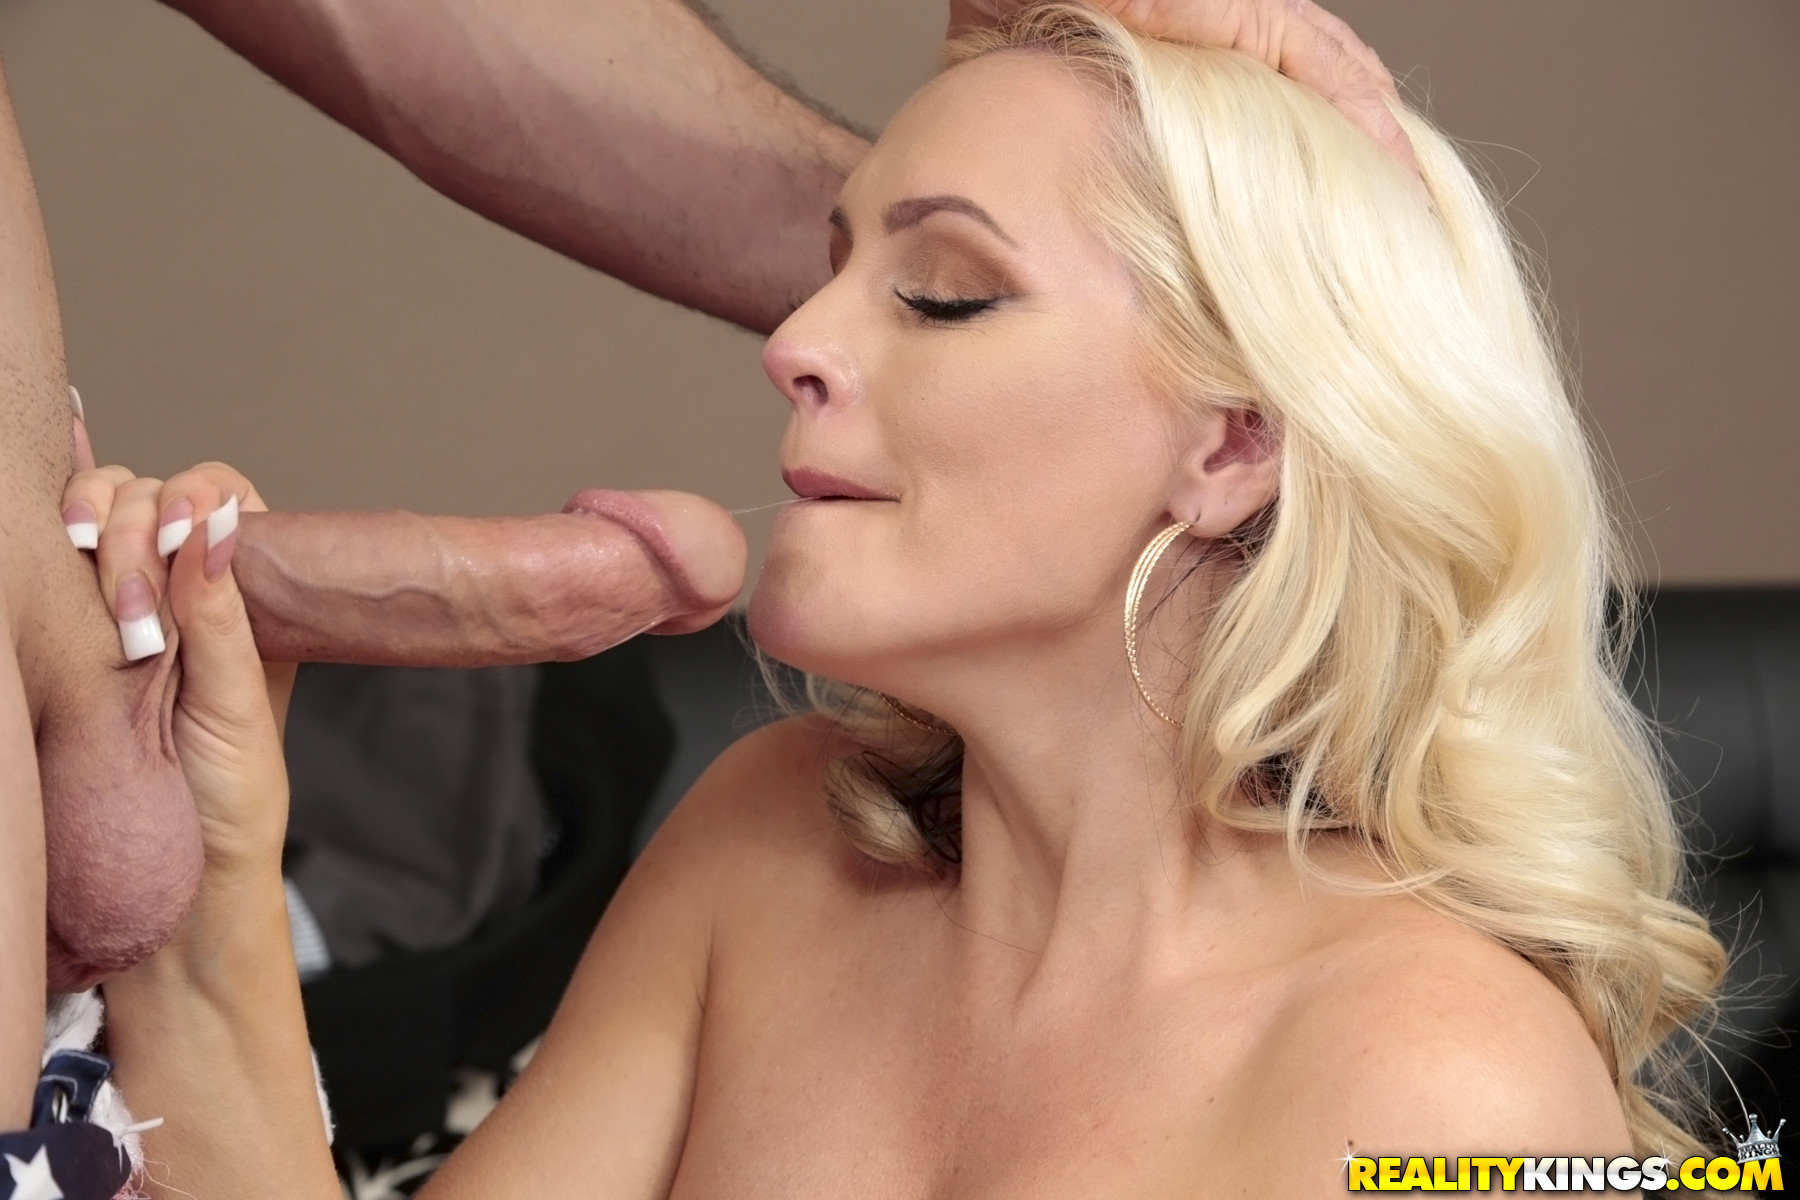 Hot fake tits blonde full blowjob